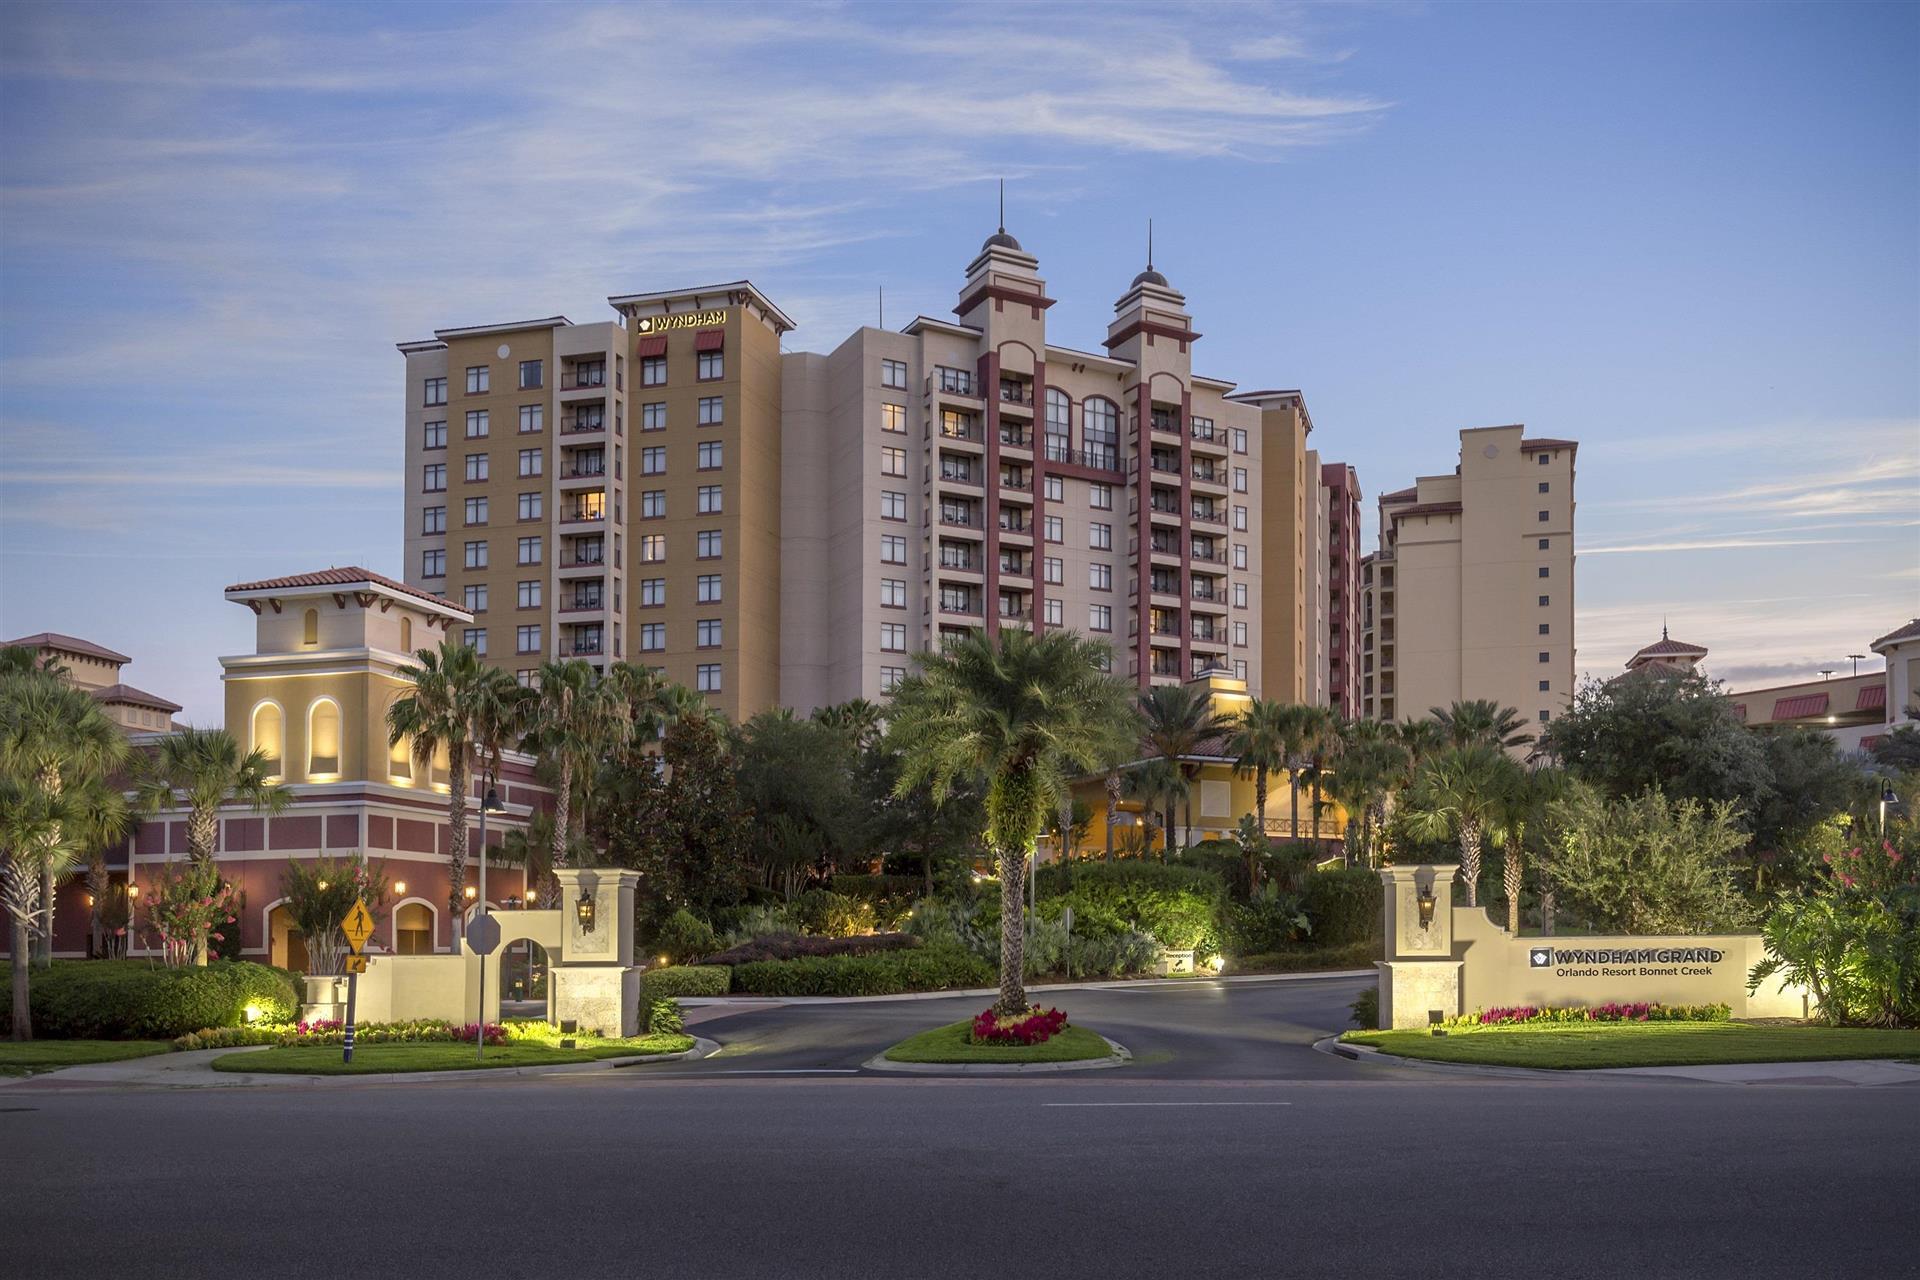 Meetings and events at Wyndham Grand Orlando Resort Bonnet Creek ...